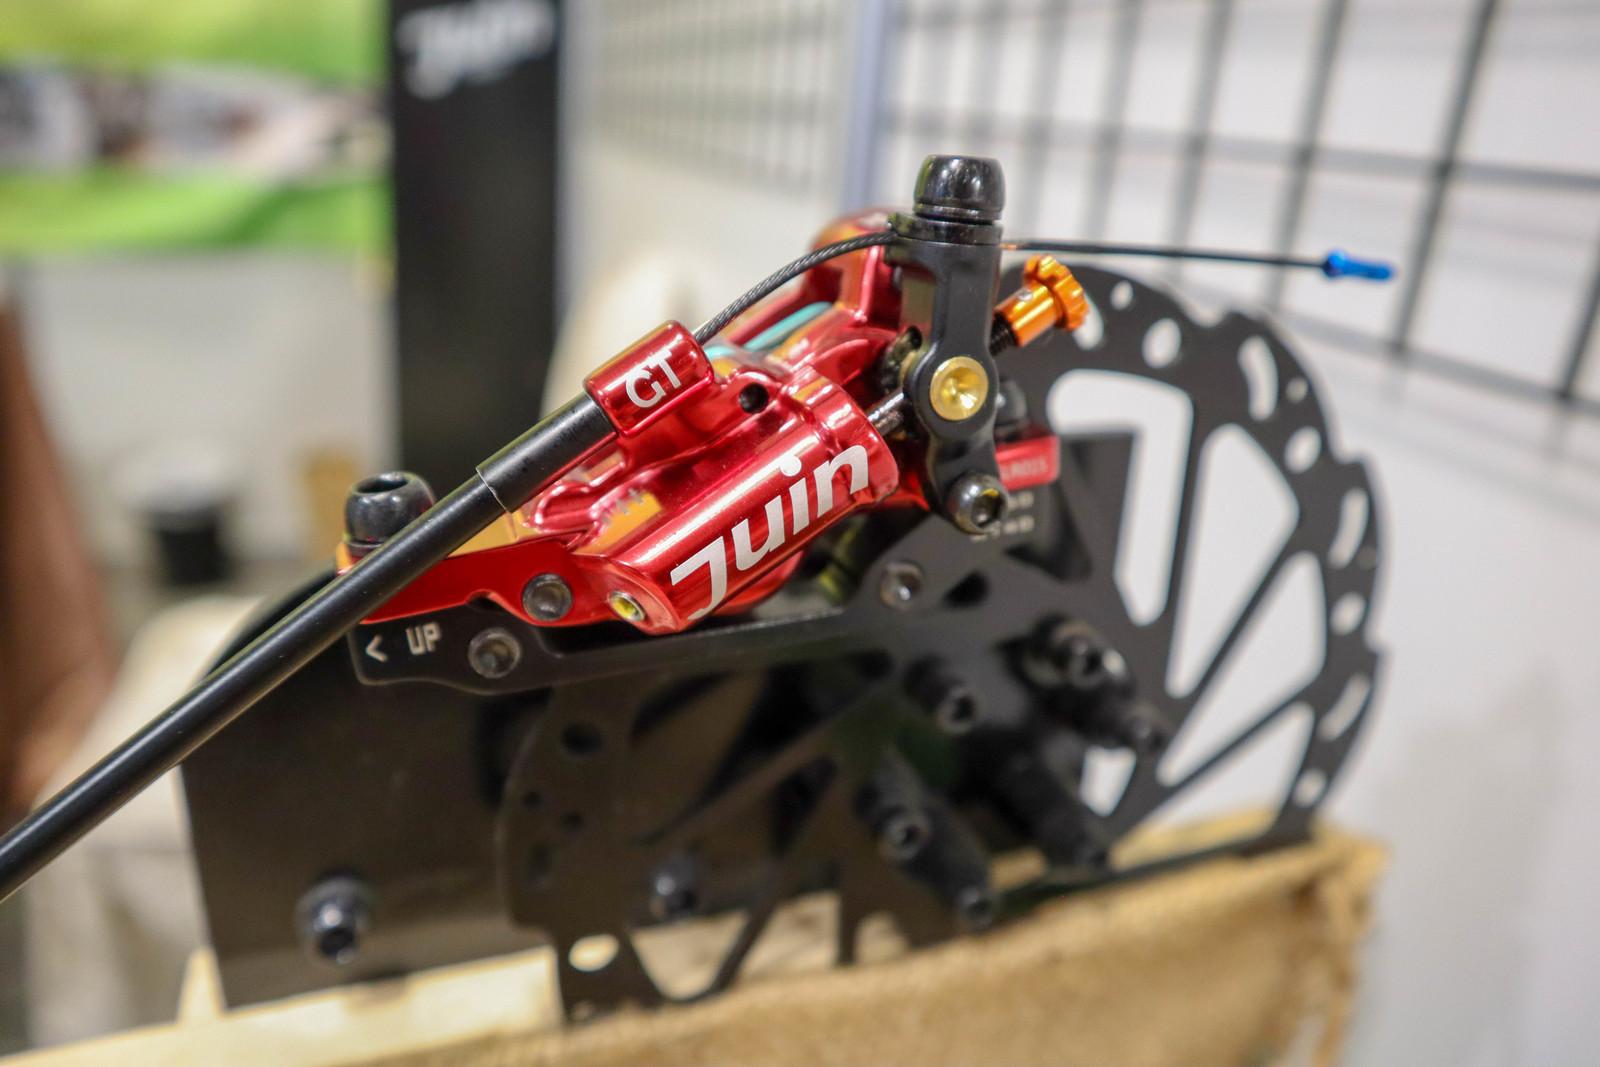 Juin Mechanically Actuated Hydraulic Disk Brake - Crazy Bike Tech from Taichung Bike Week - Mountain Biking Pictures - Vital MTB